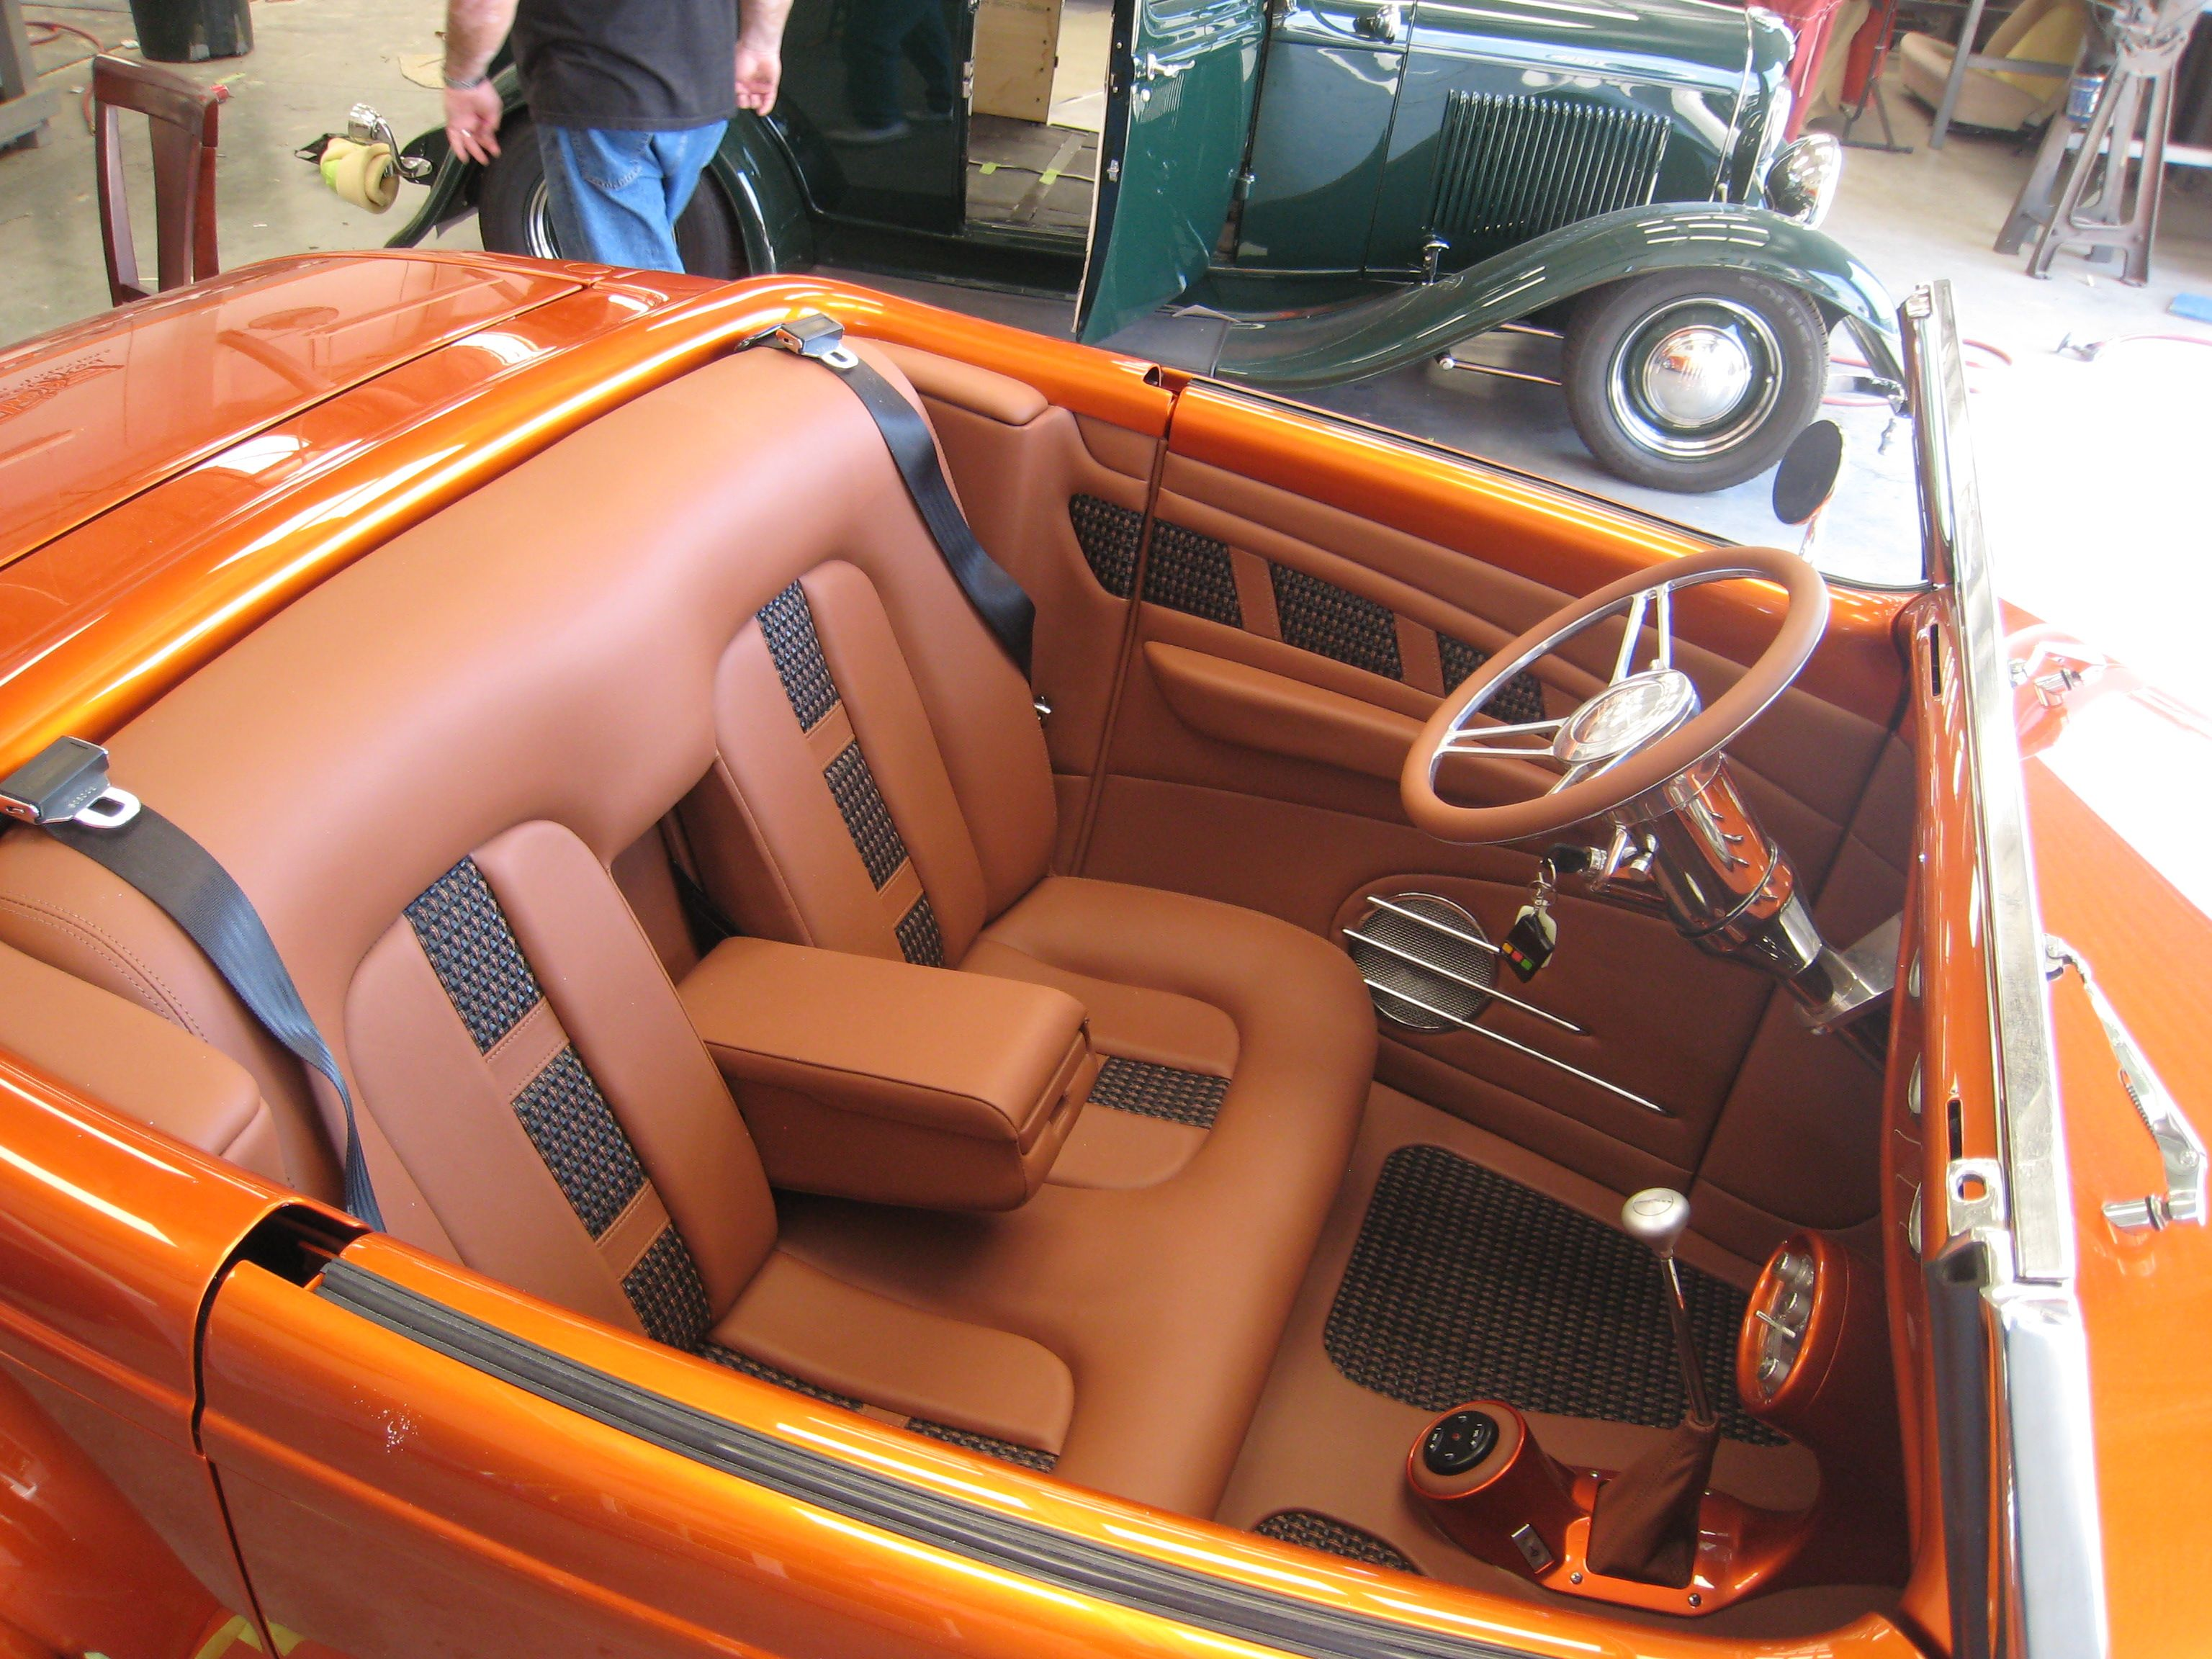 Img 3271 Jpg 3072 2304 Hotrod Interior Dearborn 32 Ford Roadster